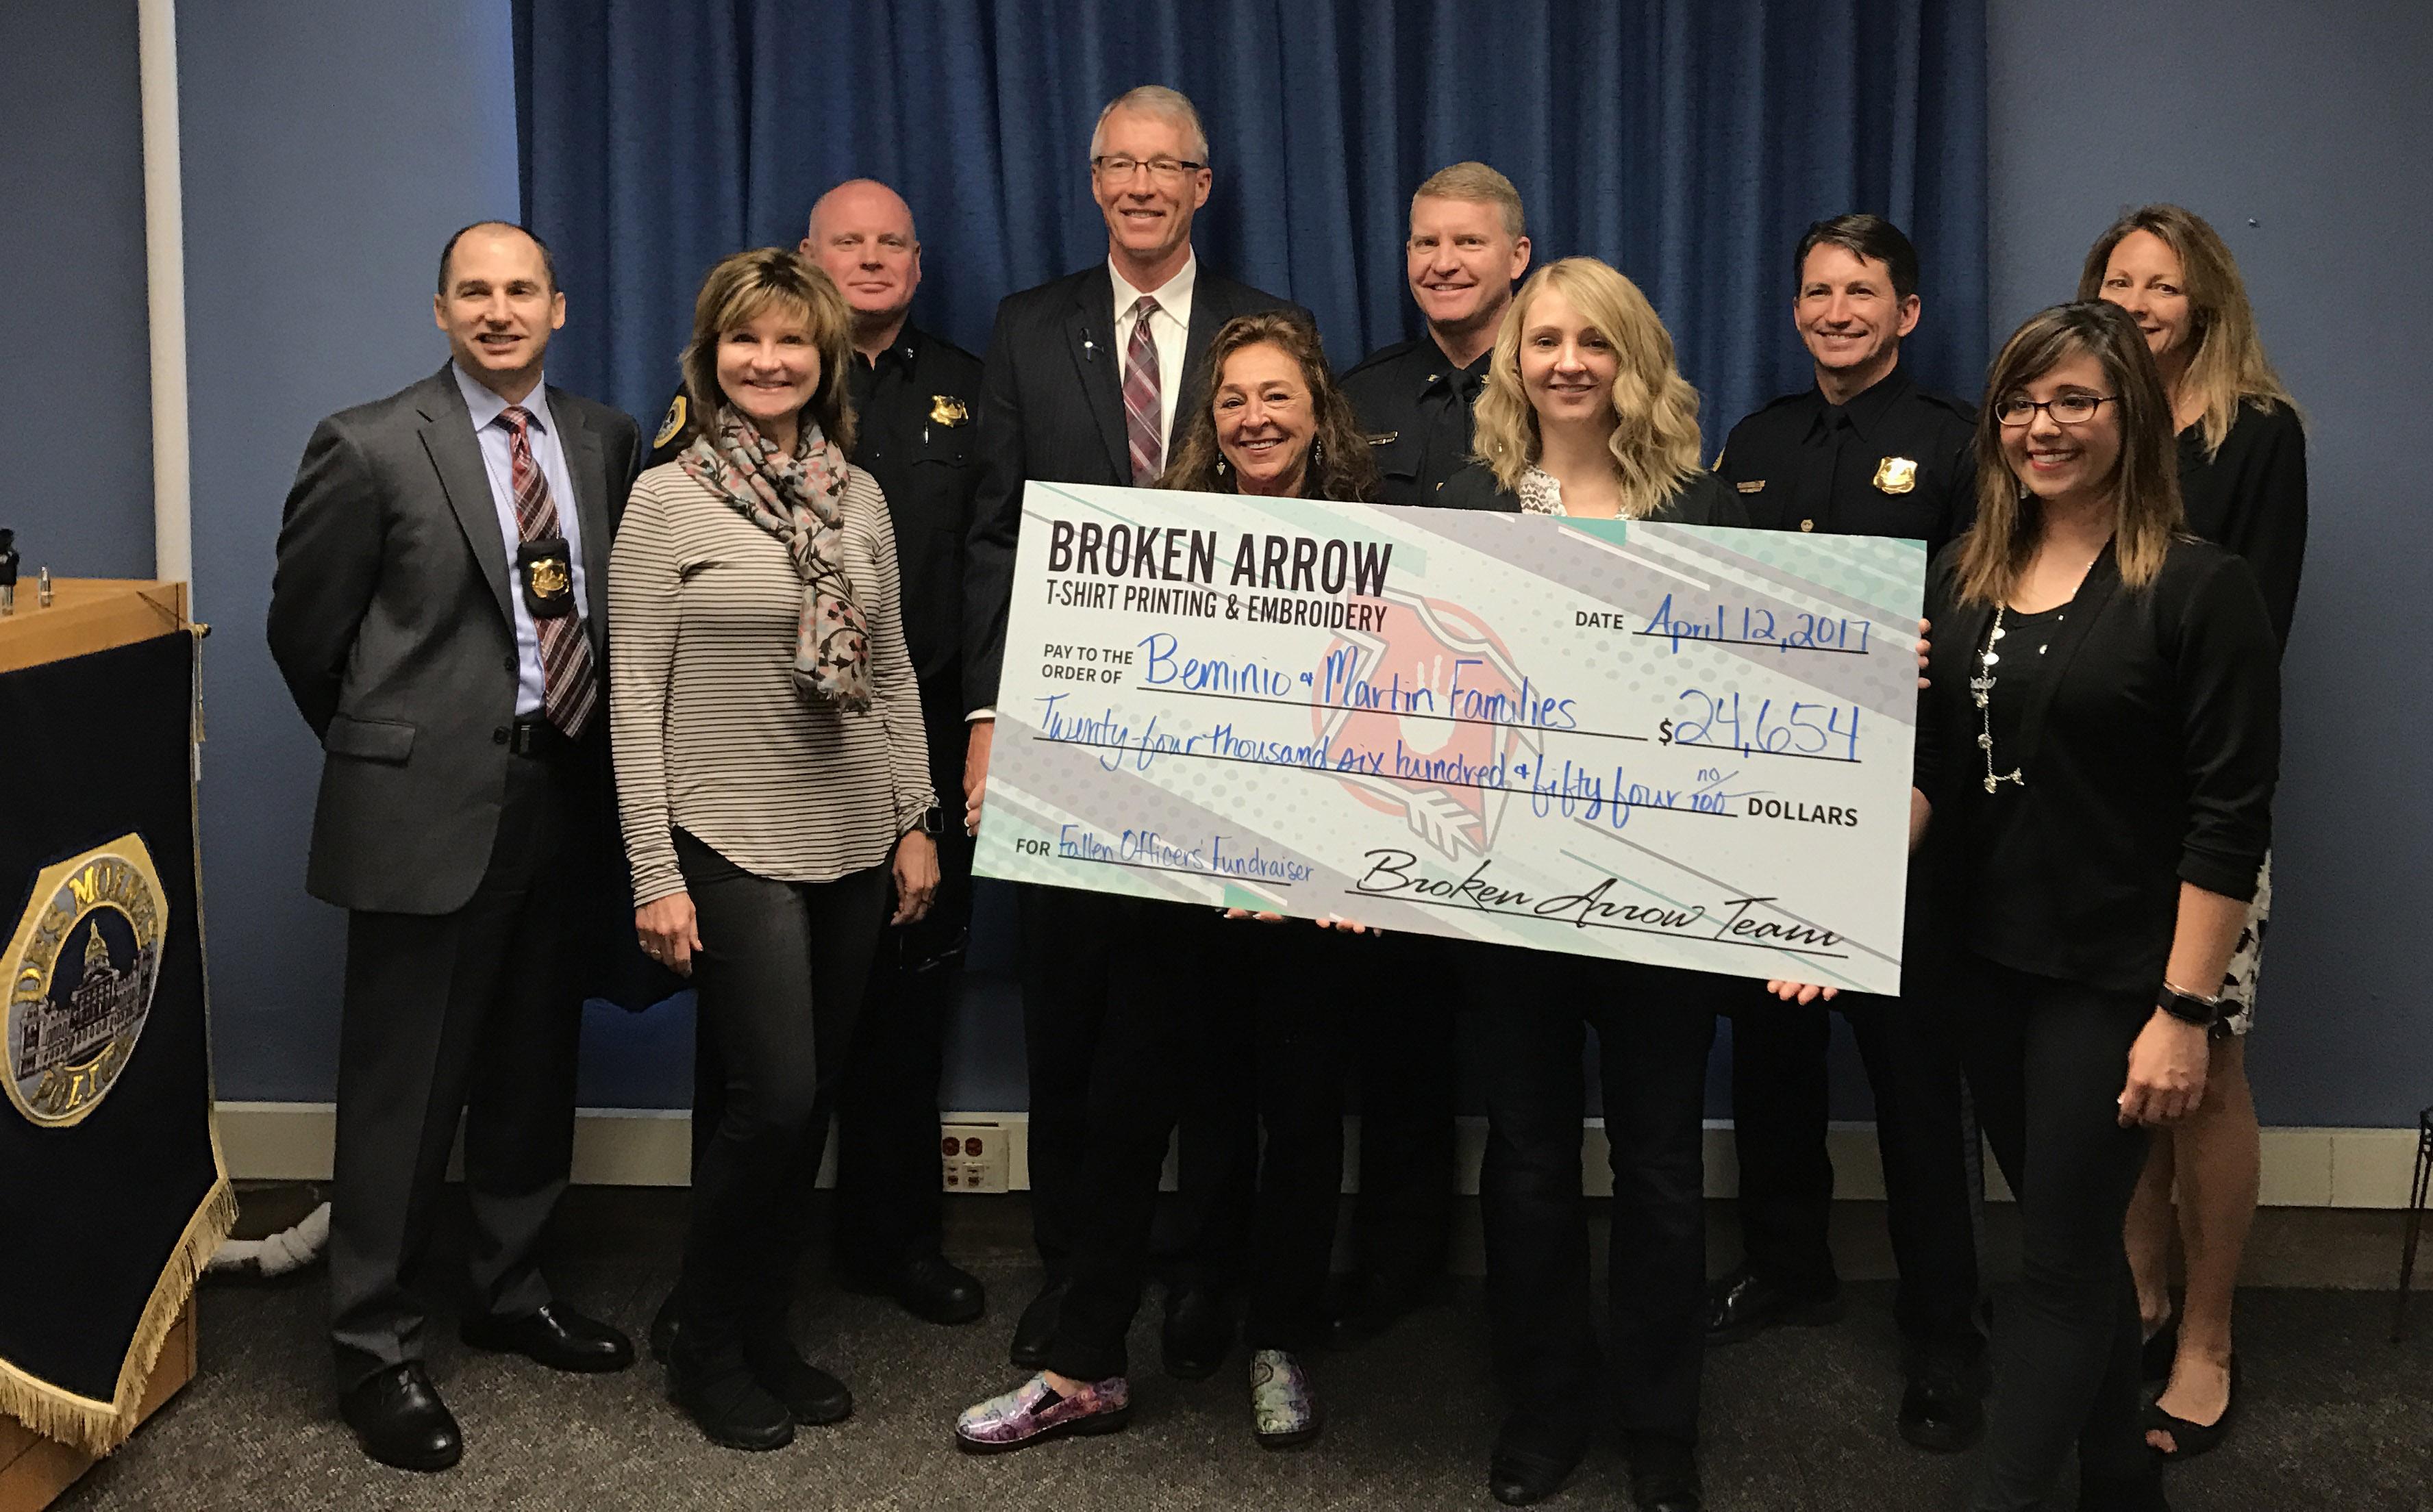 Broken Arrow Donates $24,000 through T-shirt Fundraiser!